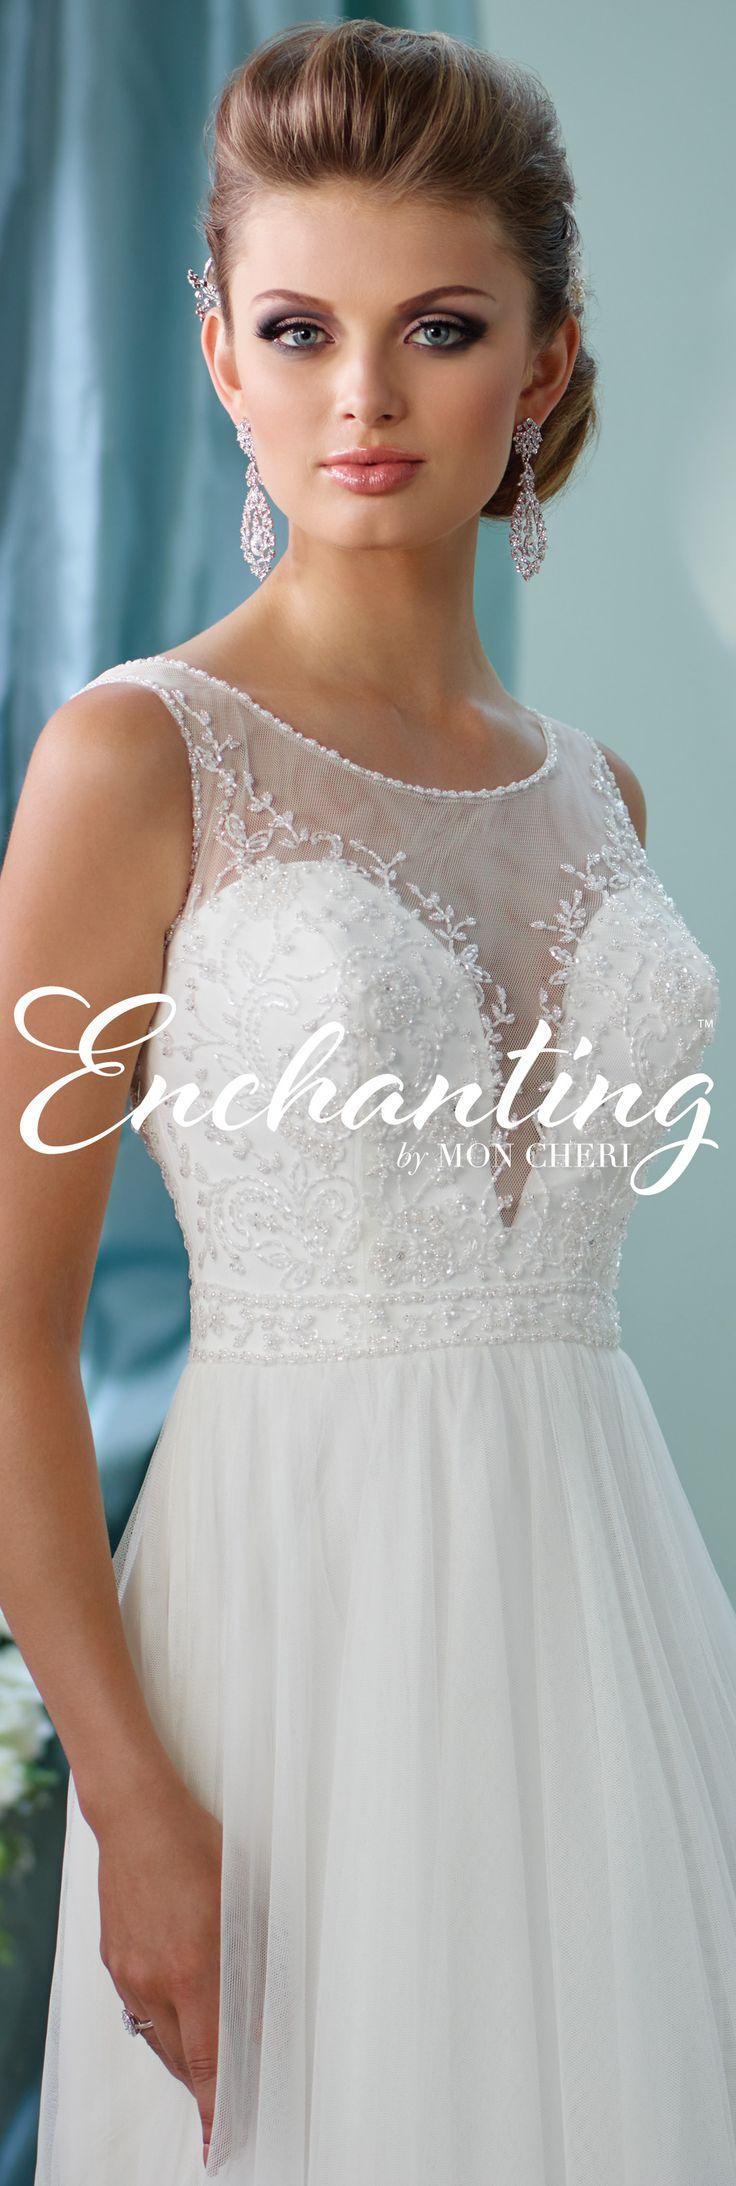 Свадьба - Enchanting By Mon Cheri